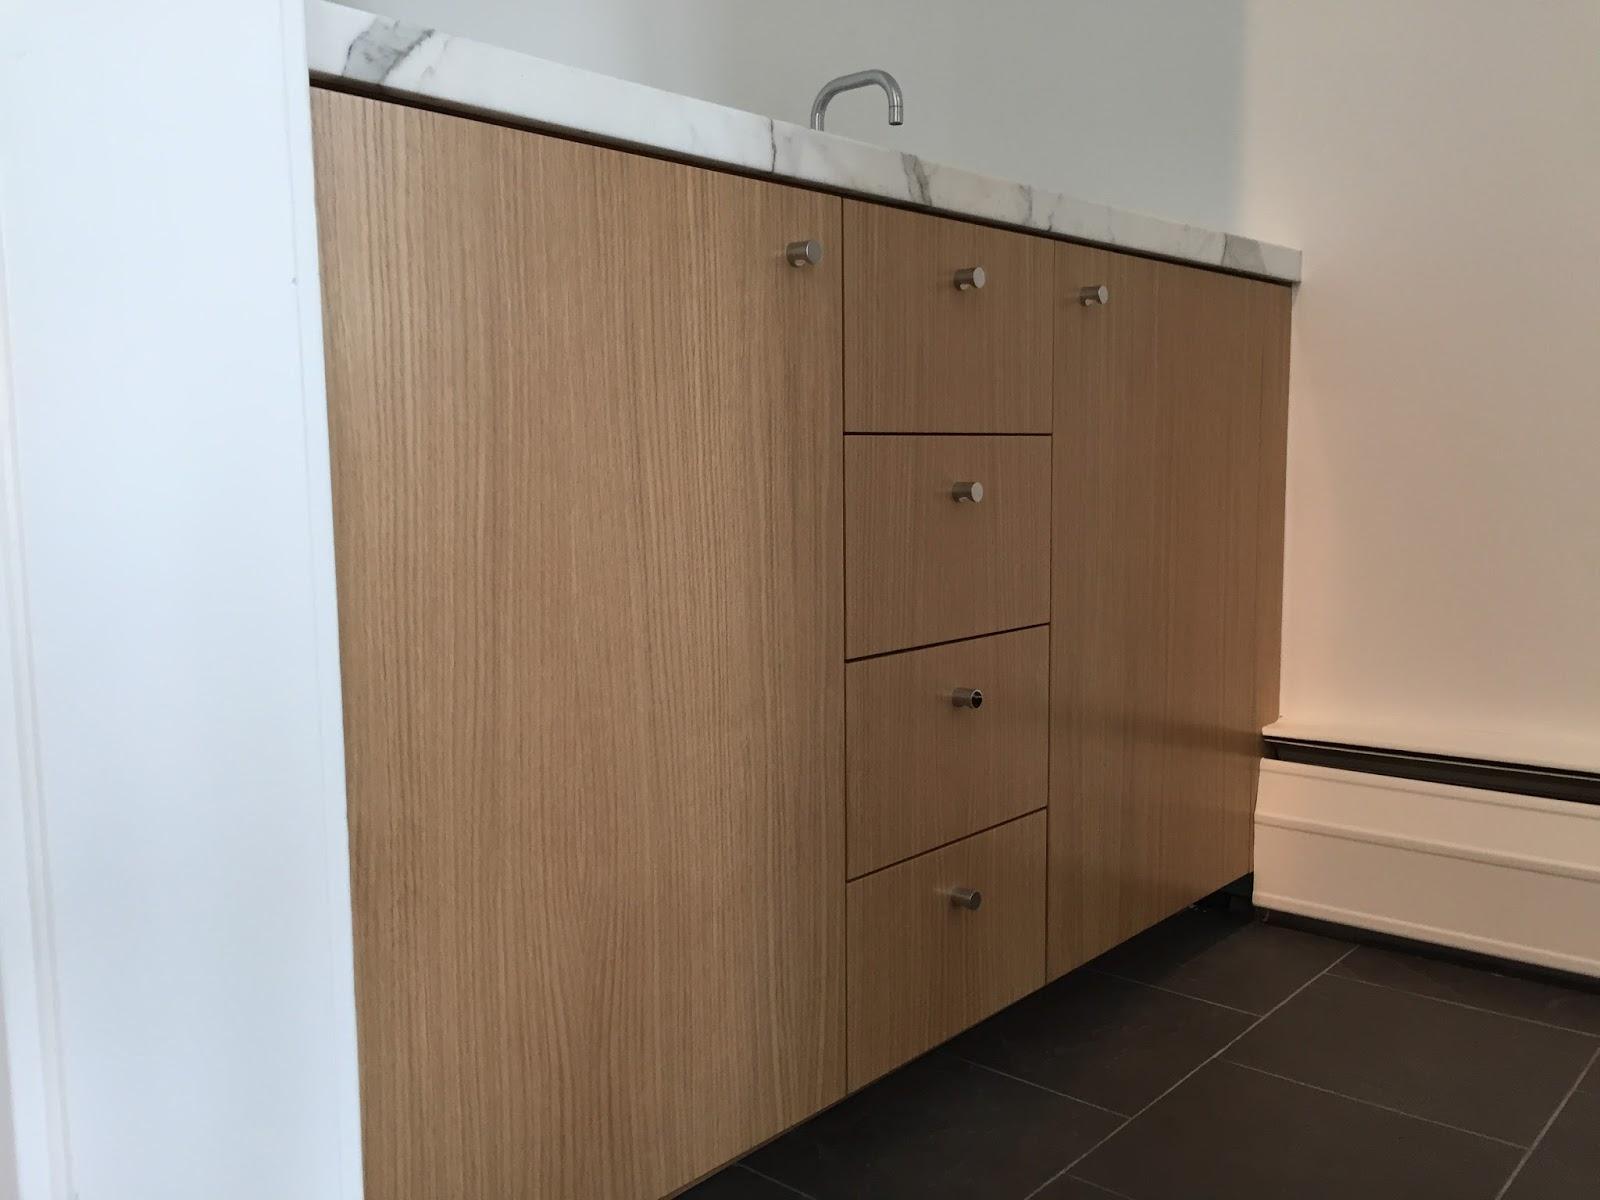 90 bathroom vanity in white architecture home design u2022 rh proexito co 90 Inch Vanity 90 Inch Vanity